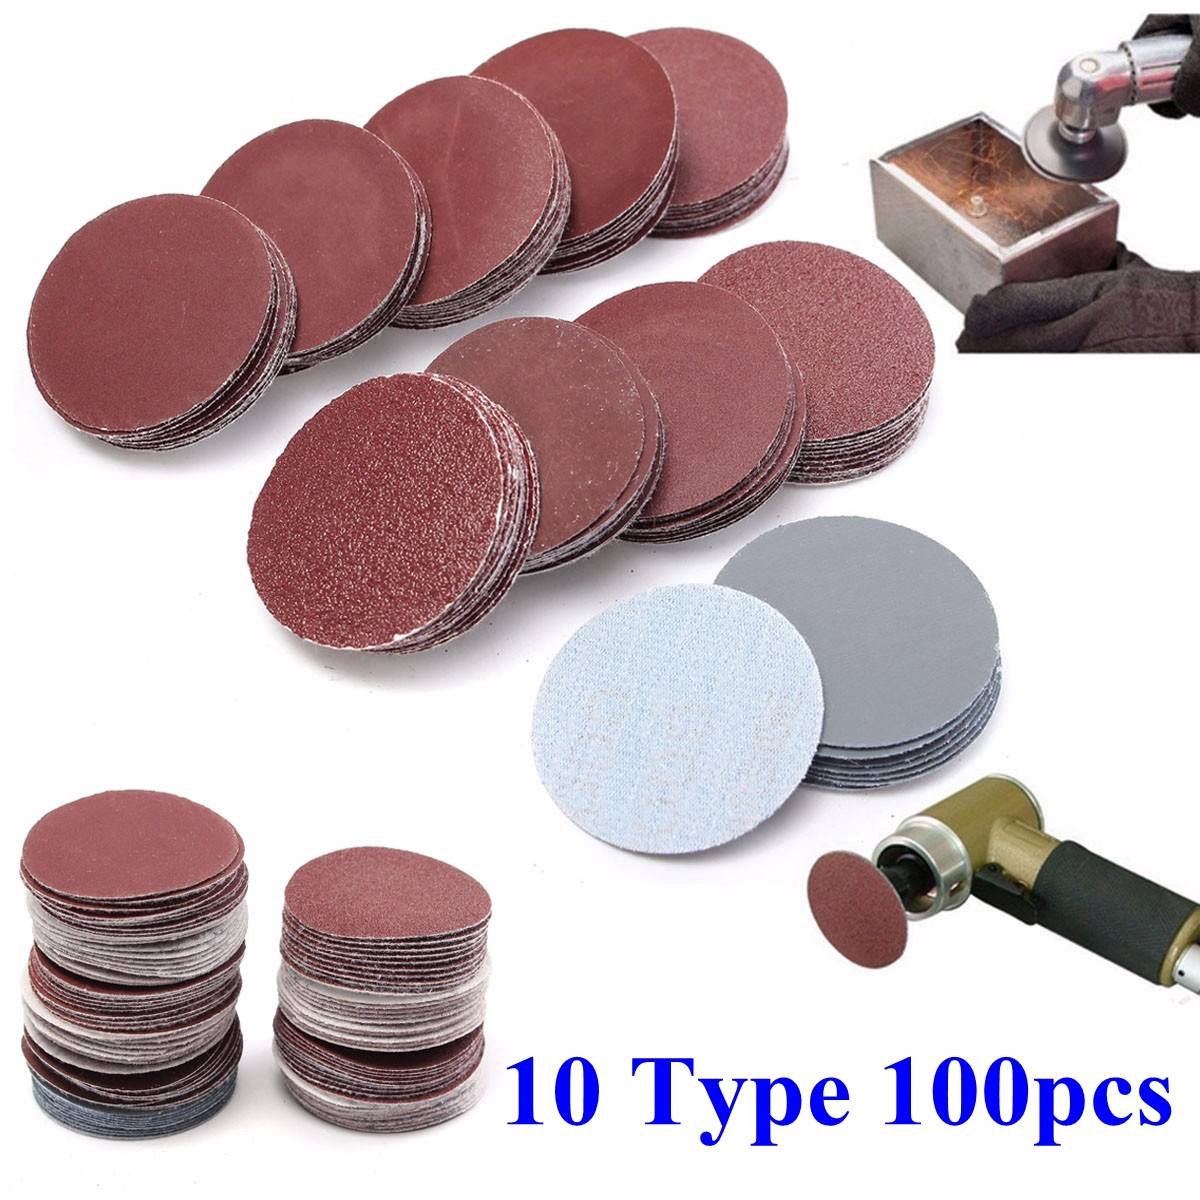 100pcs Sanding Disc 2inch 50mm Sandpaper 80 100 180 240 600 800 1000 1200 2000 3000Grit Polishing Discs Mixed Sandpaper Set